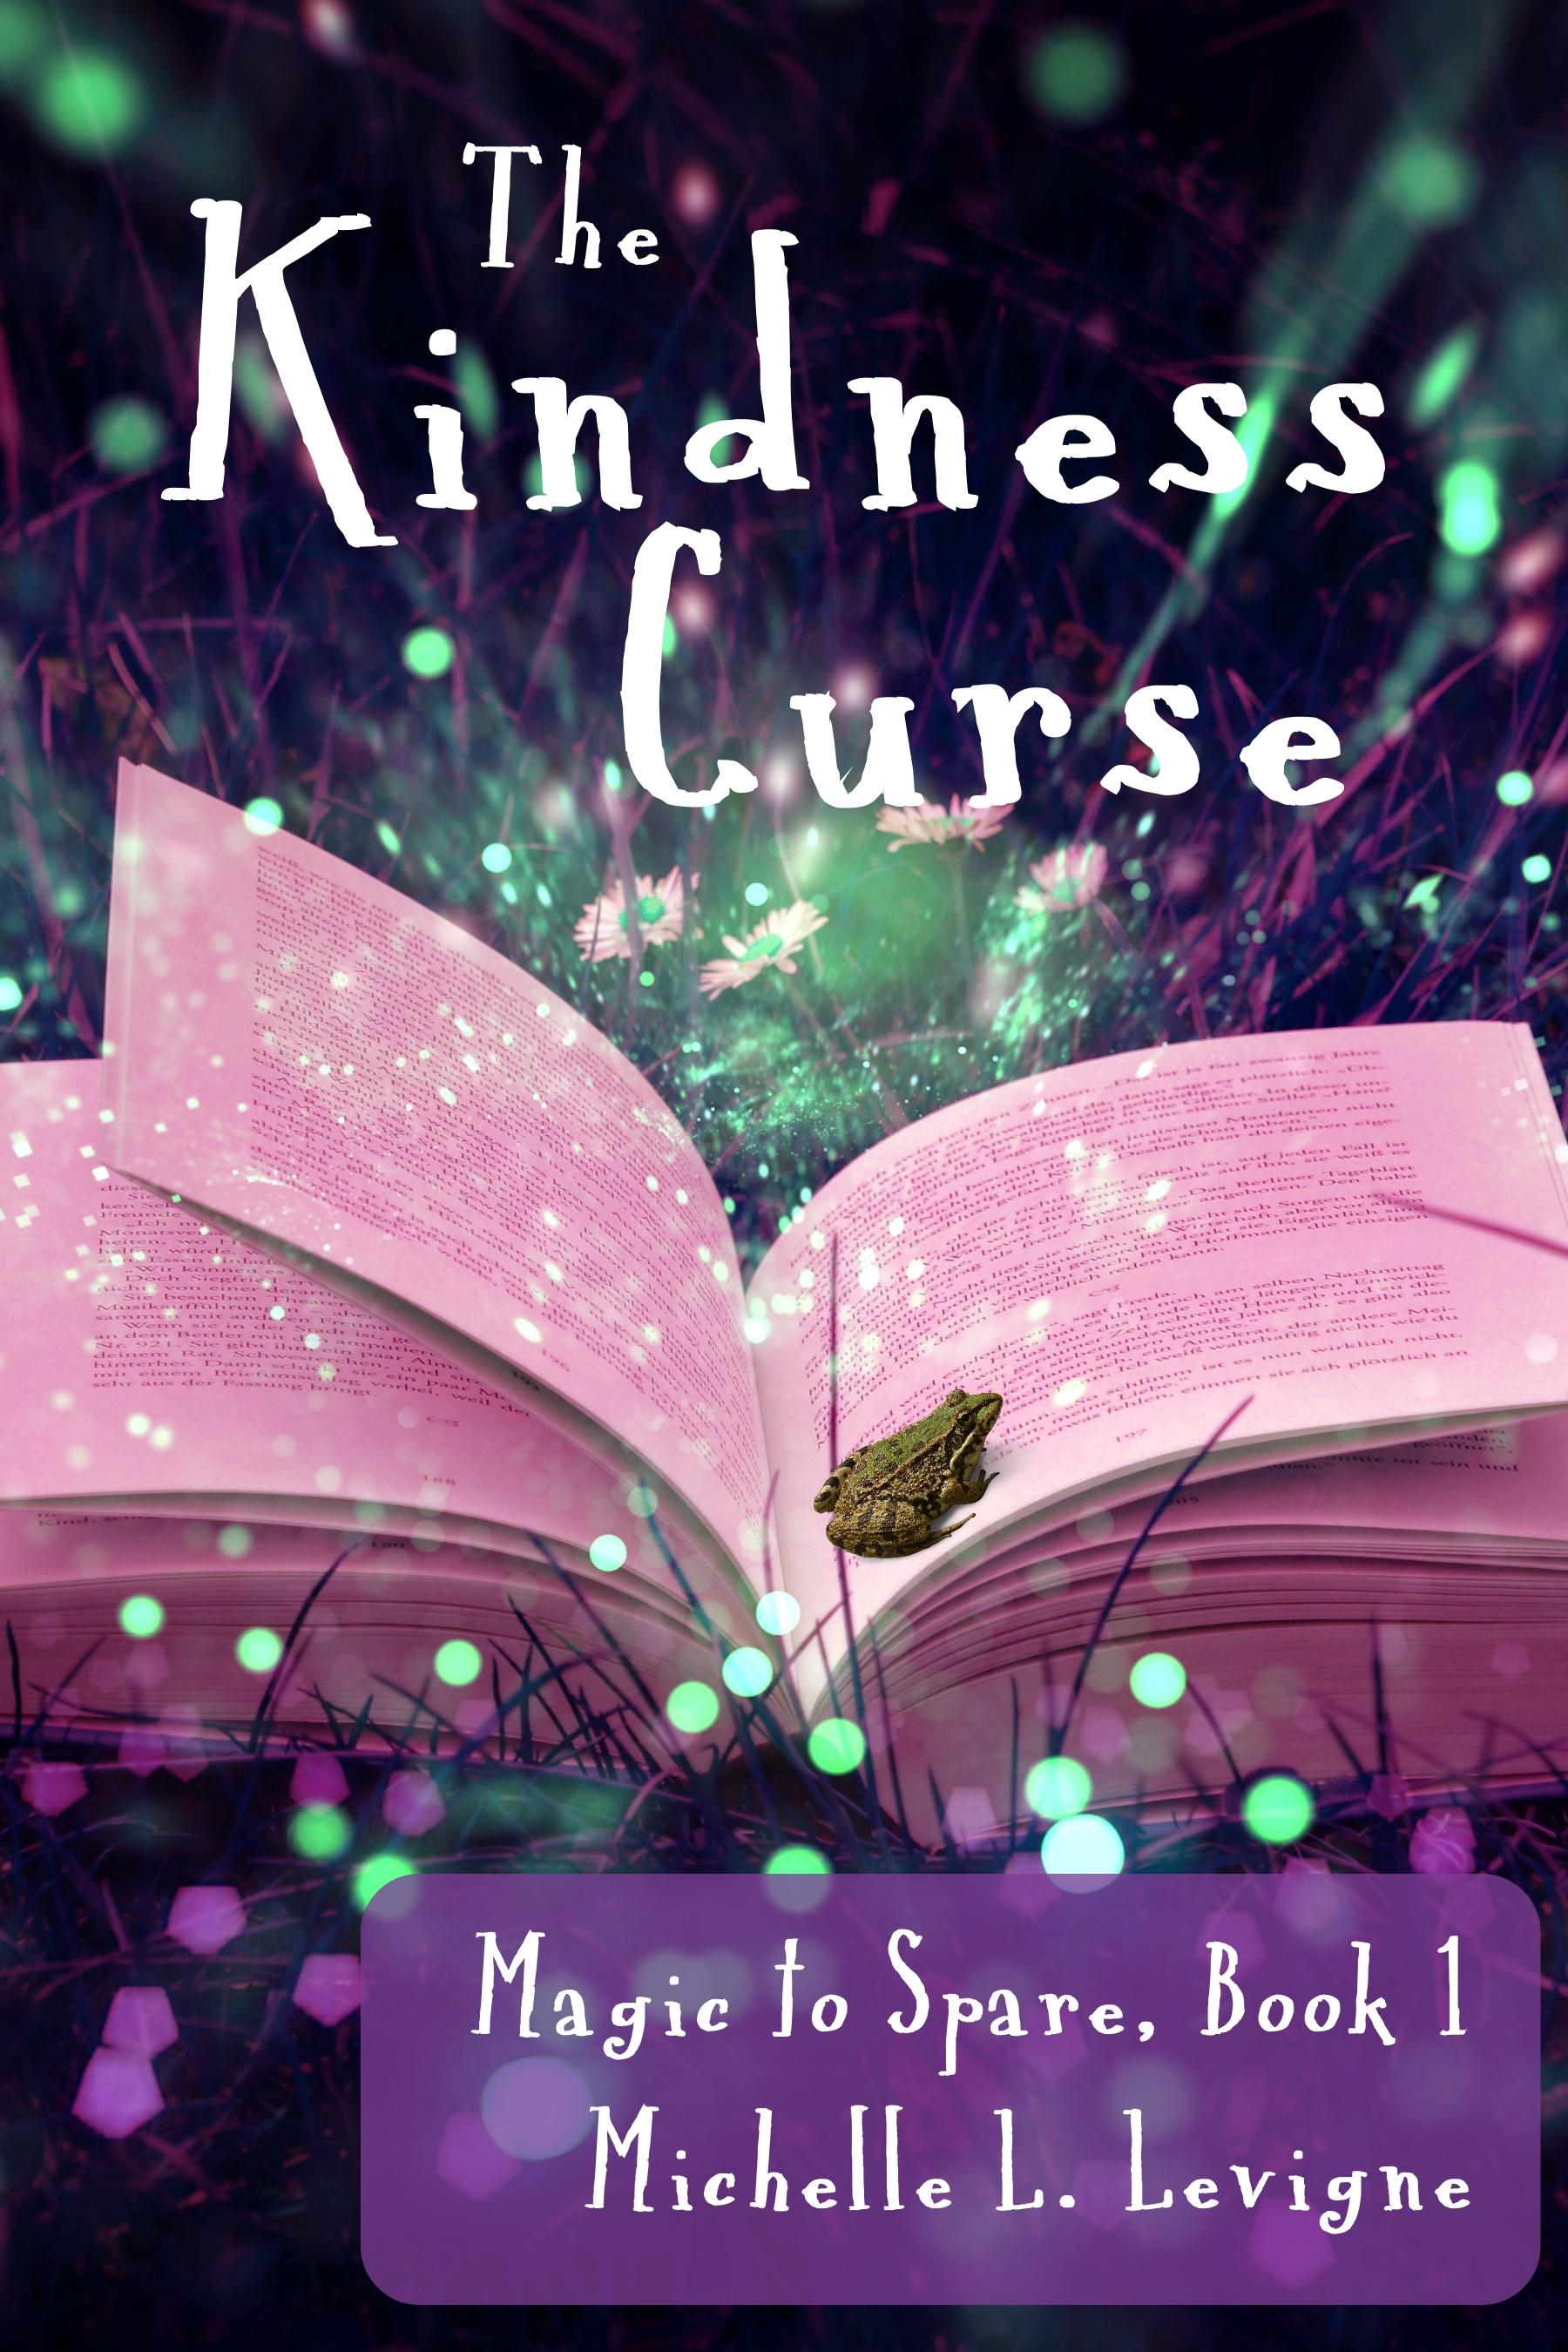 The Kindness Curse by Michelle L. Levigne